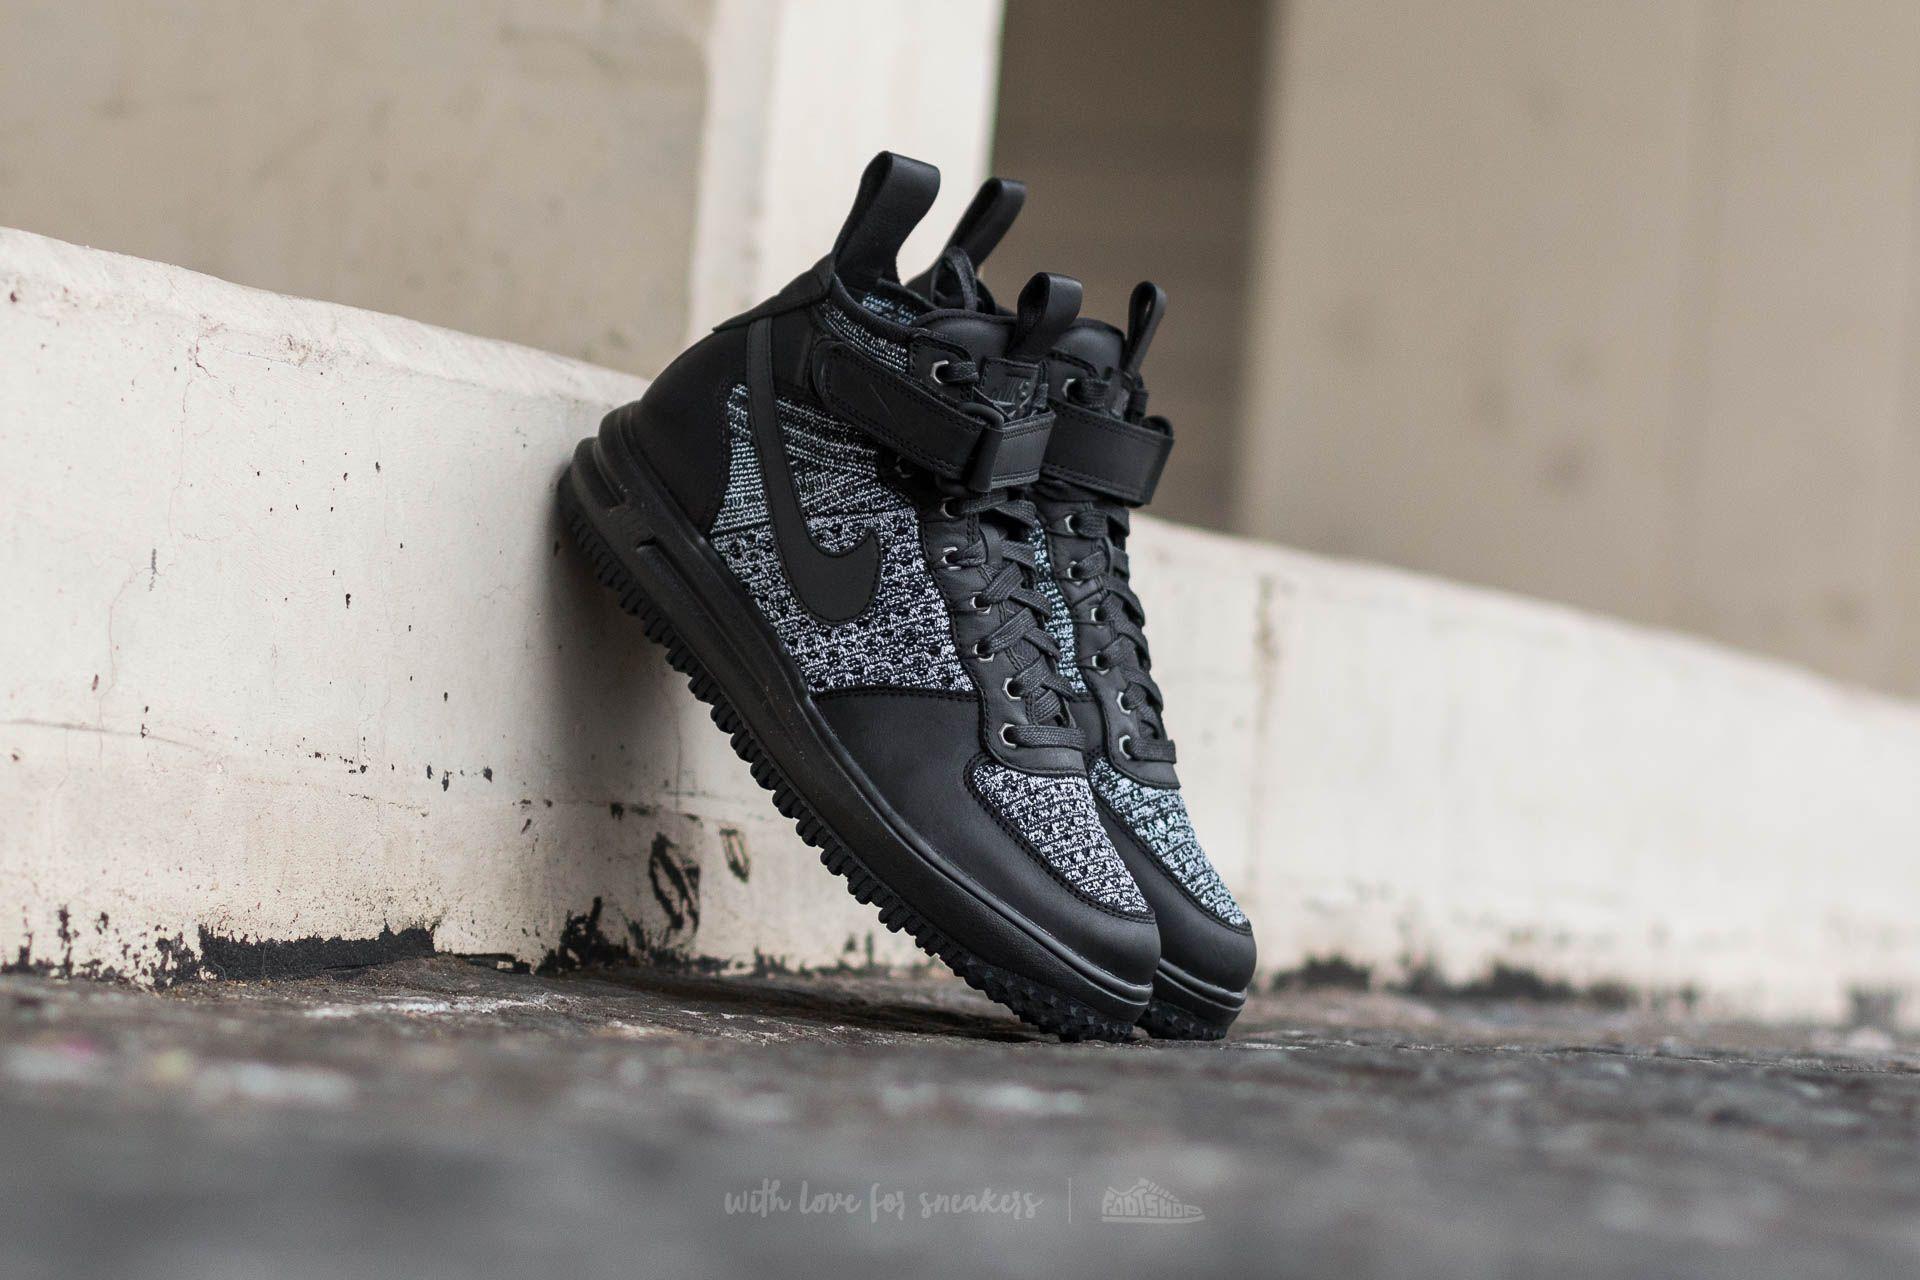 Nike W Lunar Force 1 Flyknit Workboot Black/ Black-White-Cool Grey